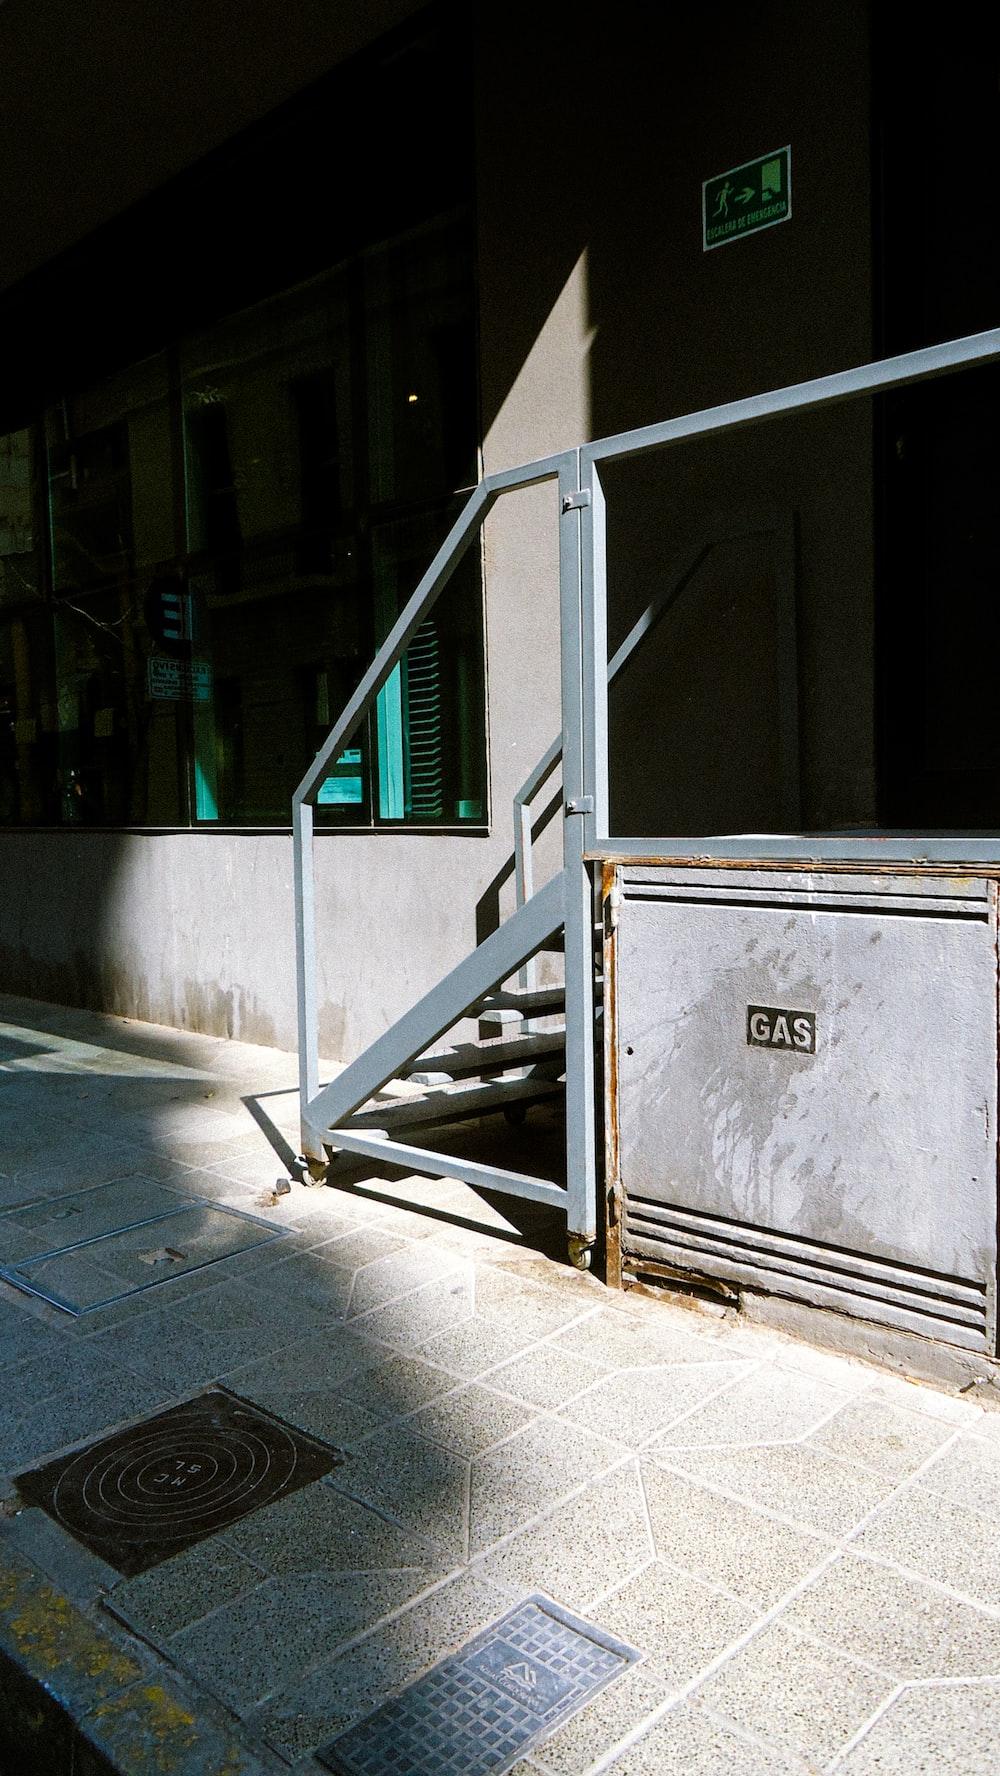 white and gray trash bin beside gray concrete building